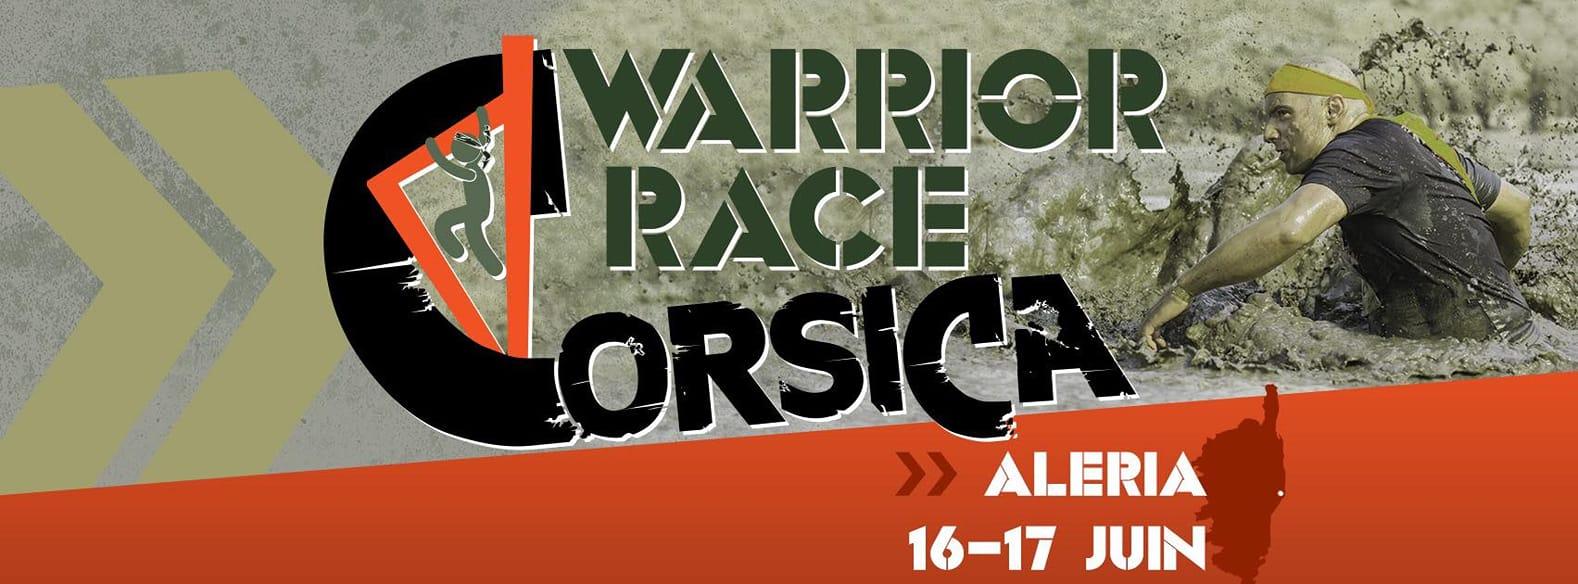 Warrior Race Corsica